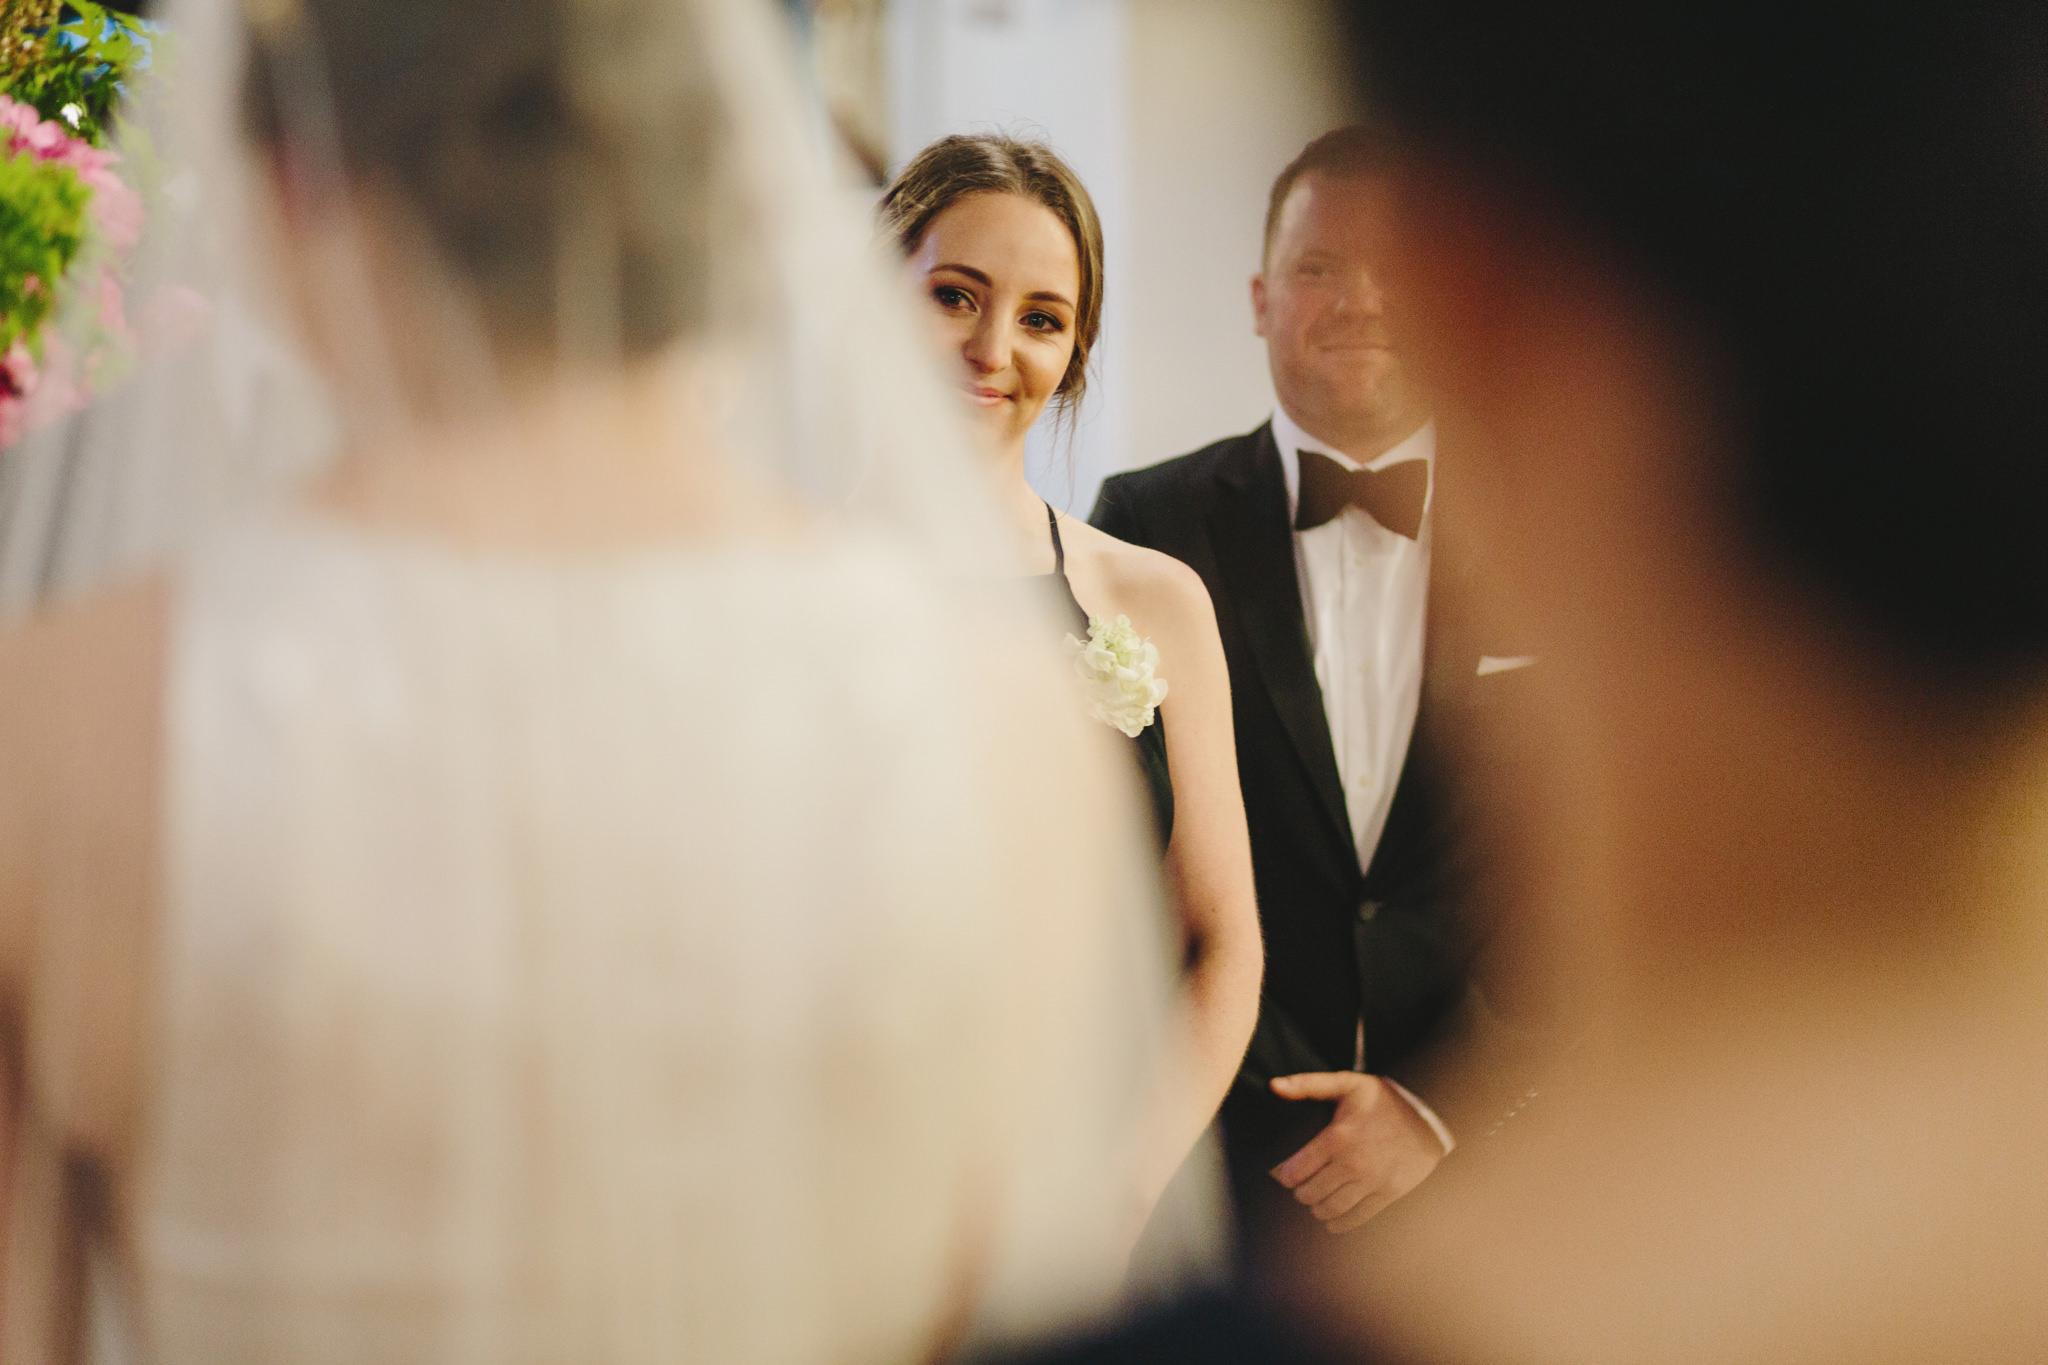 Abbotsford_Convent_Wedding_Peter_Anna059.JPG